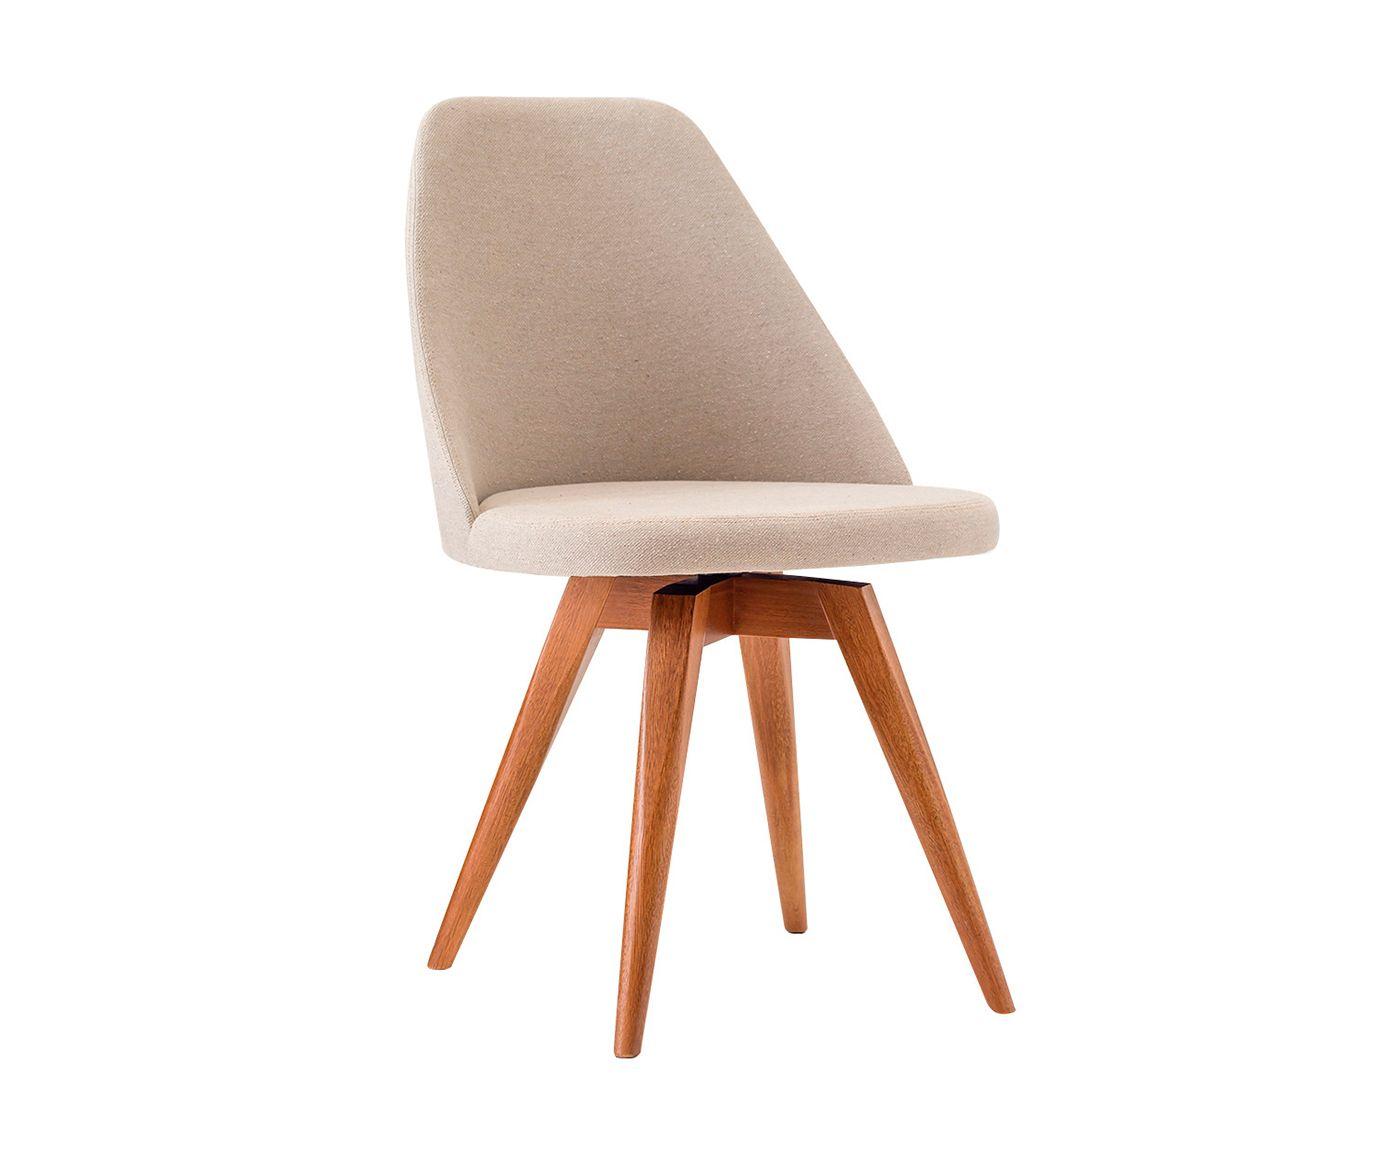 Cadeira Fixa Lucy Bege Médio - 53X86X55cm   Westwing.com.br